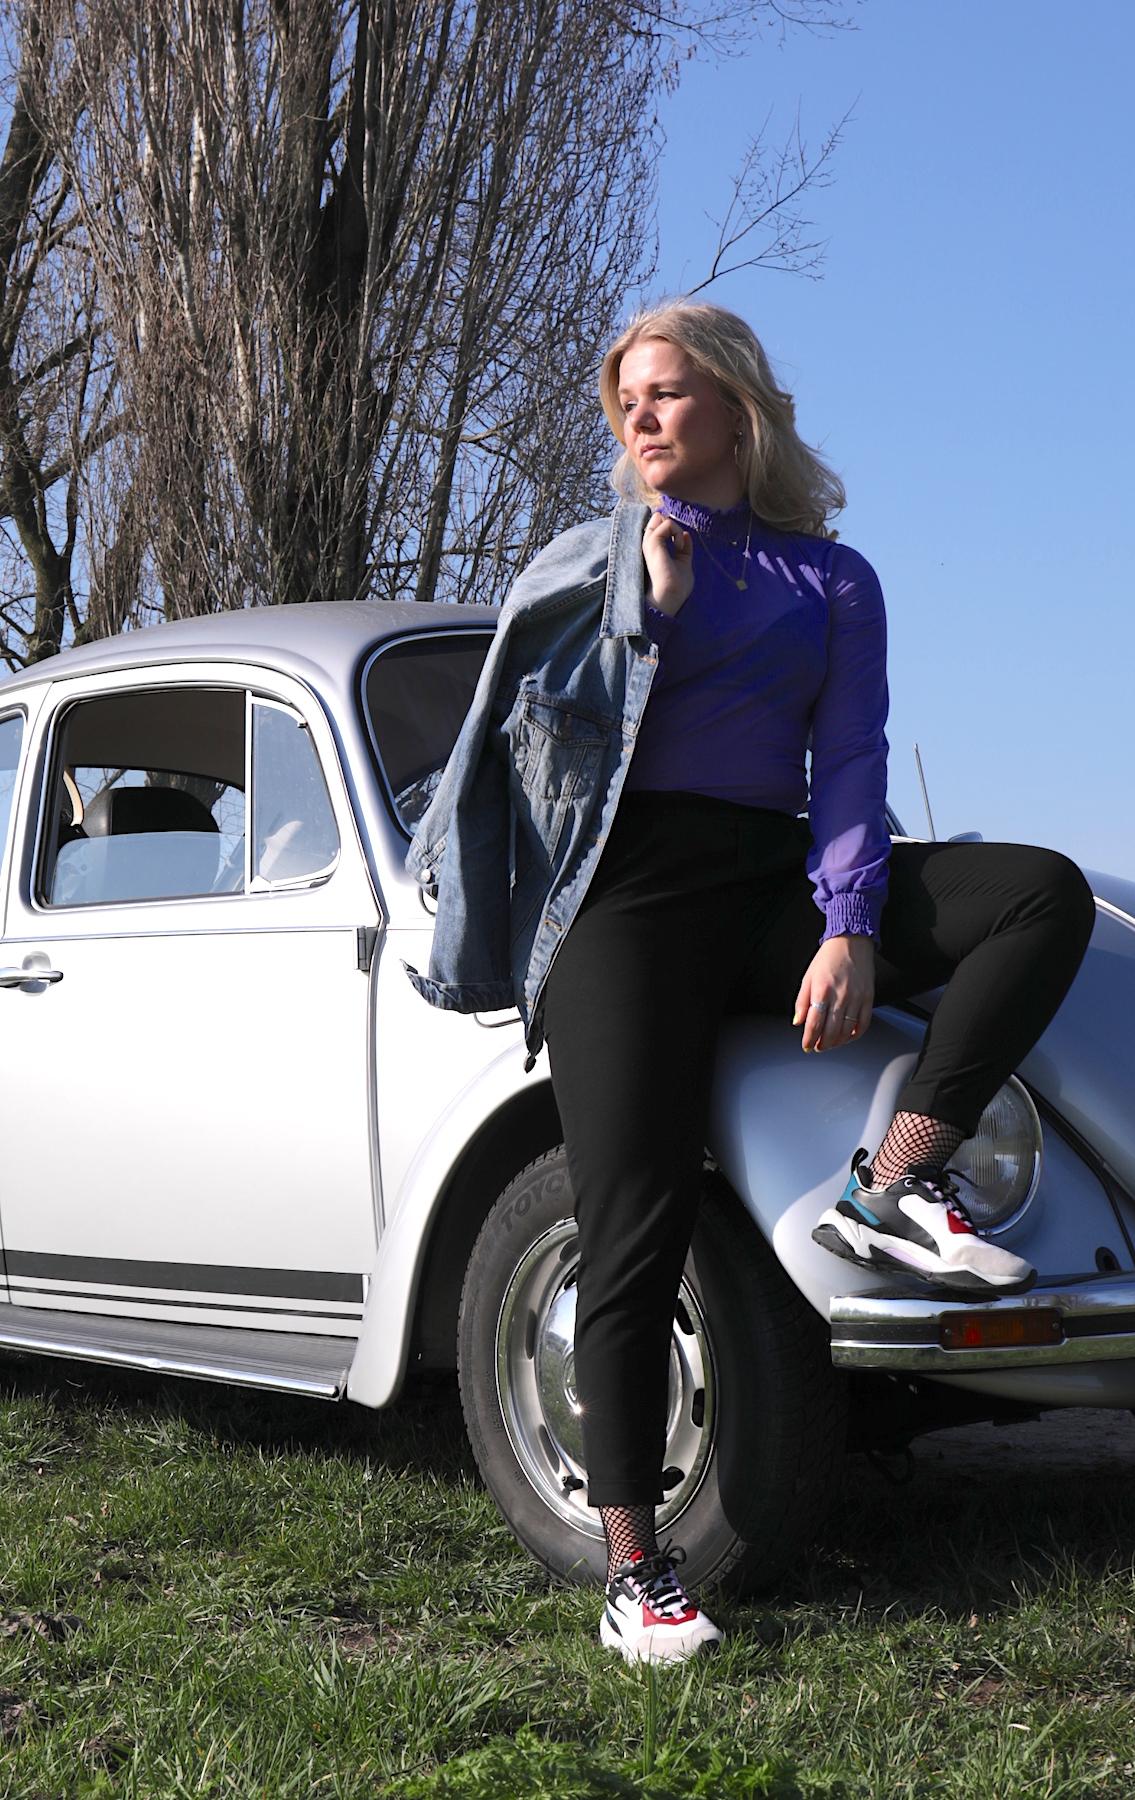 Car shoot buiten fashion lifestyle design beauty content creatie video videografie foto fotografie 4K bedrijven bedrijfsvideo bedrijfsfoto promotie- RSDesigns